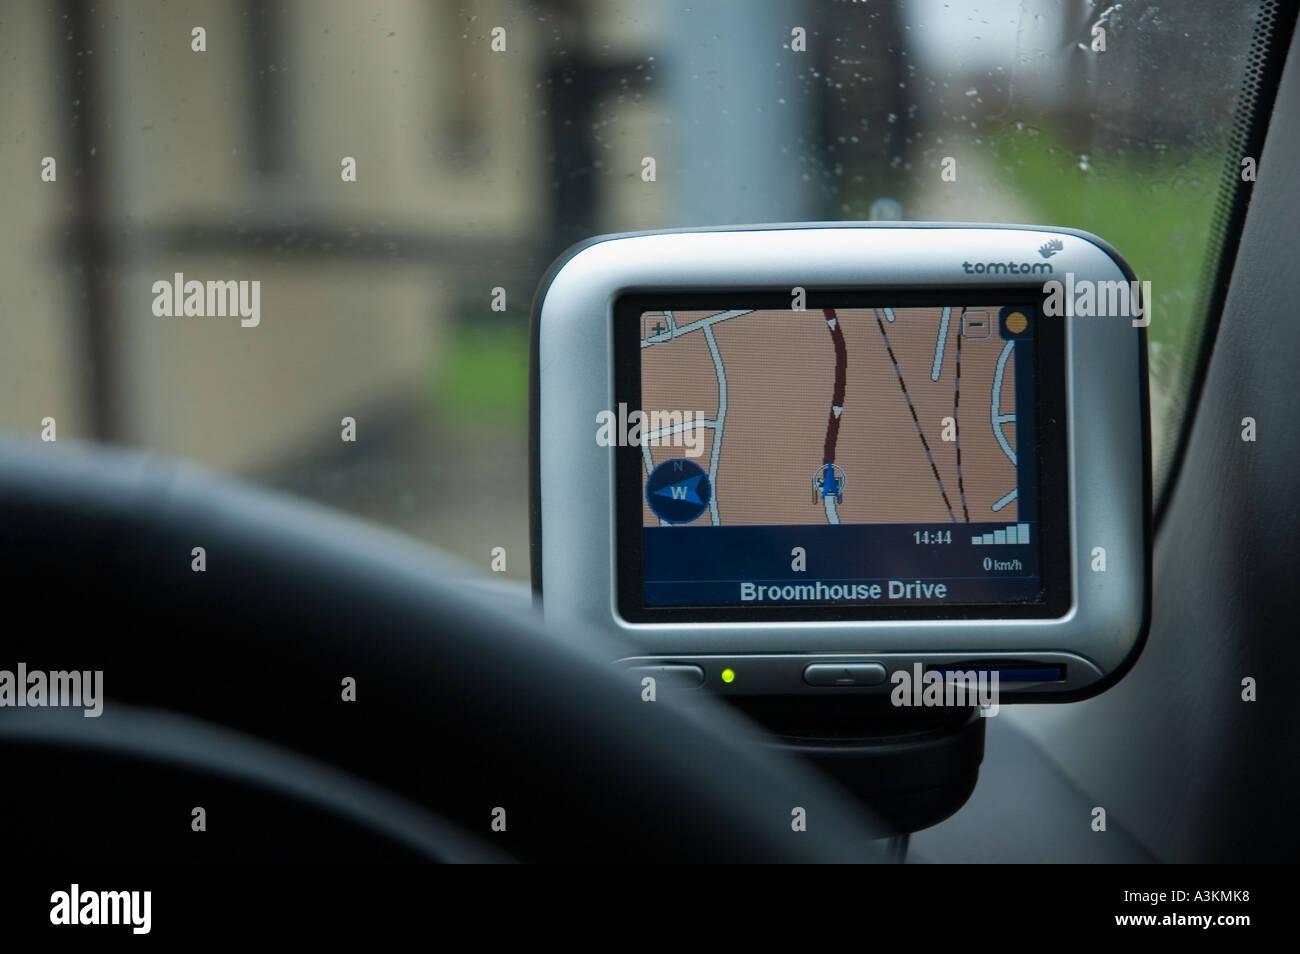 GPS TOMTOM - Stock Image